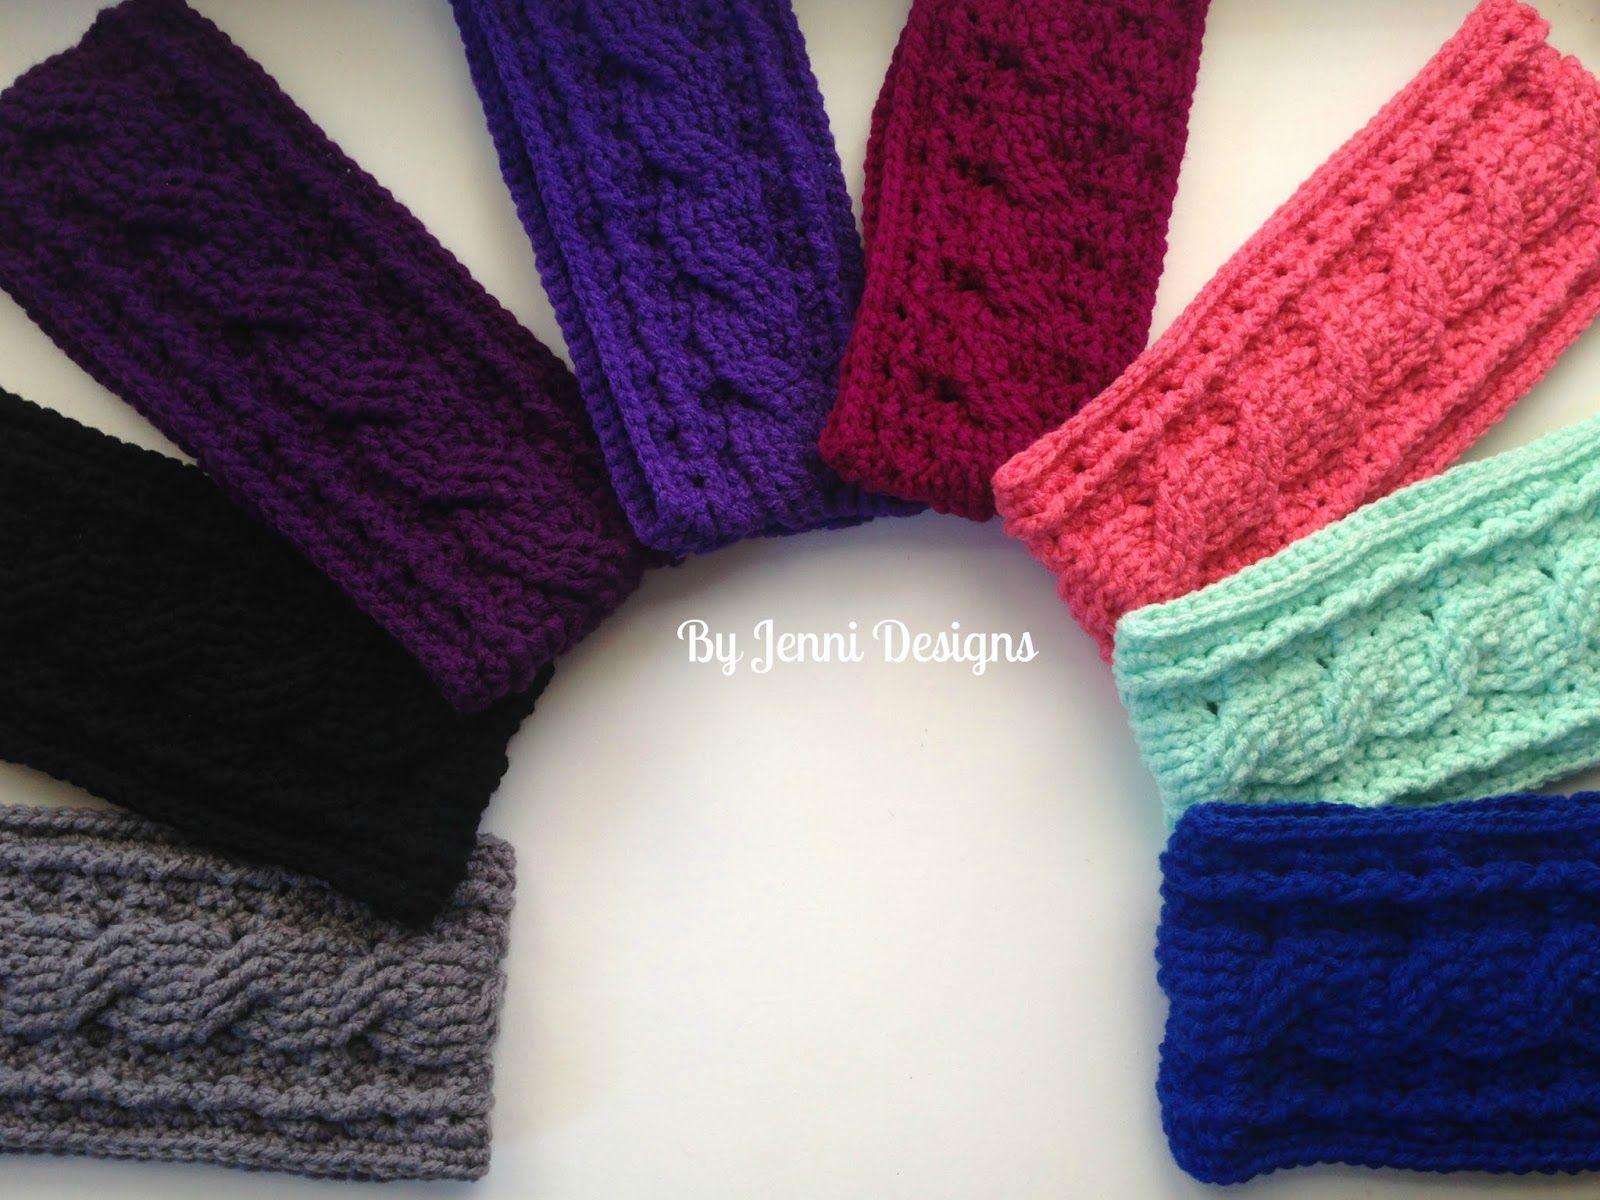 By jenni designs free crochet pattern womens cable ear warmer by jenni designs free crochet pattern womens cable ear warmer bankloansurffo Gallery